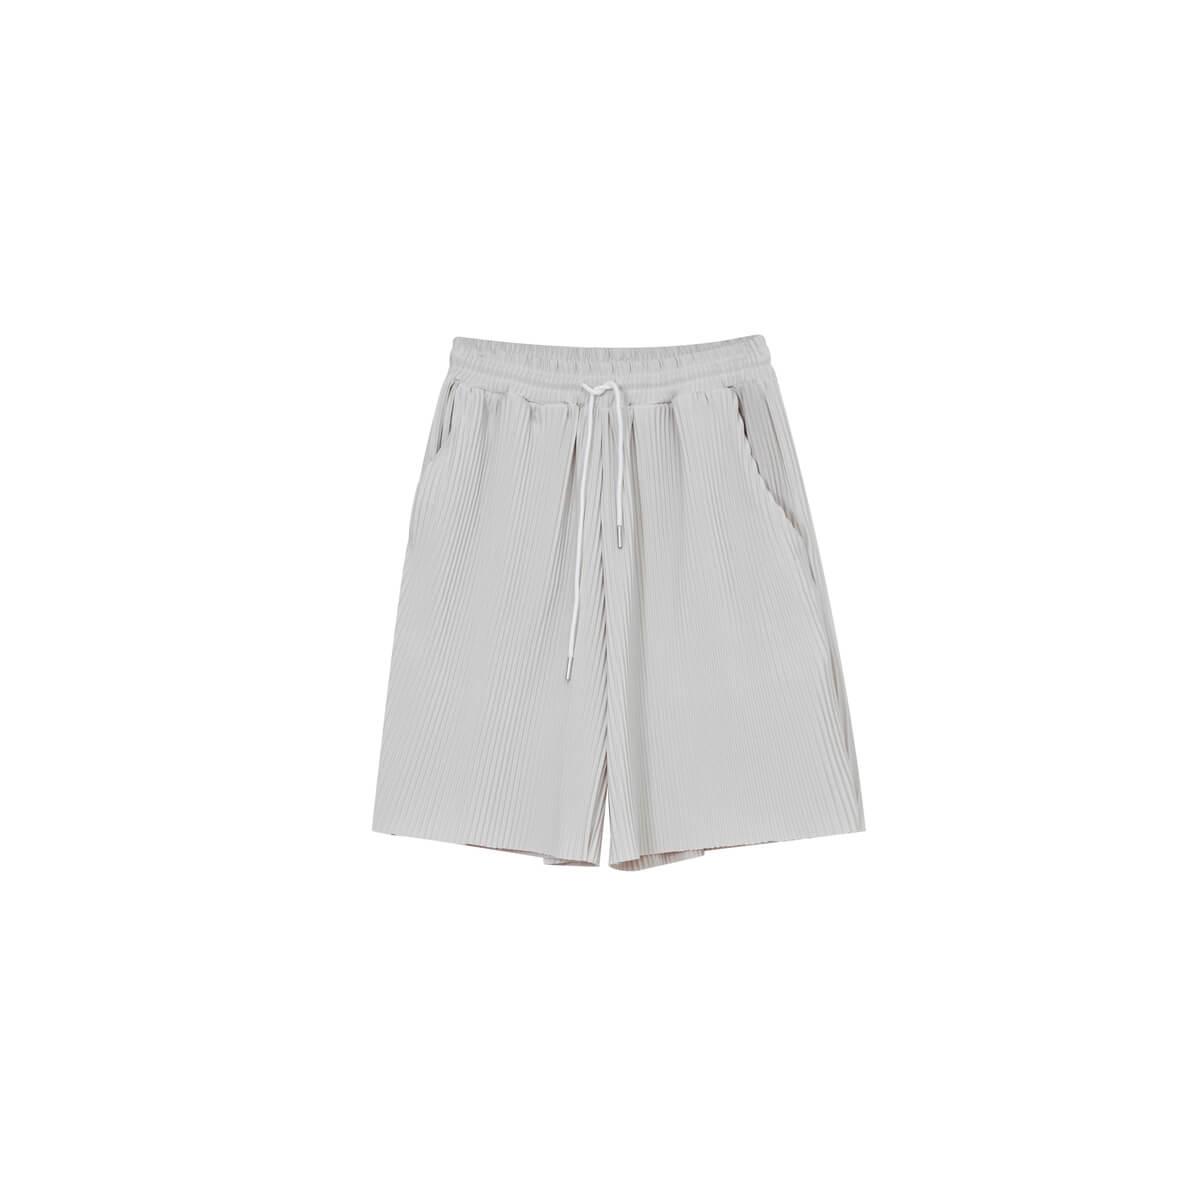 Шорты Cui Layout Studio Minimalist Vertical Striped Shorts Gray